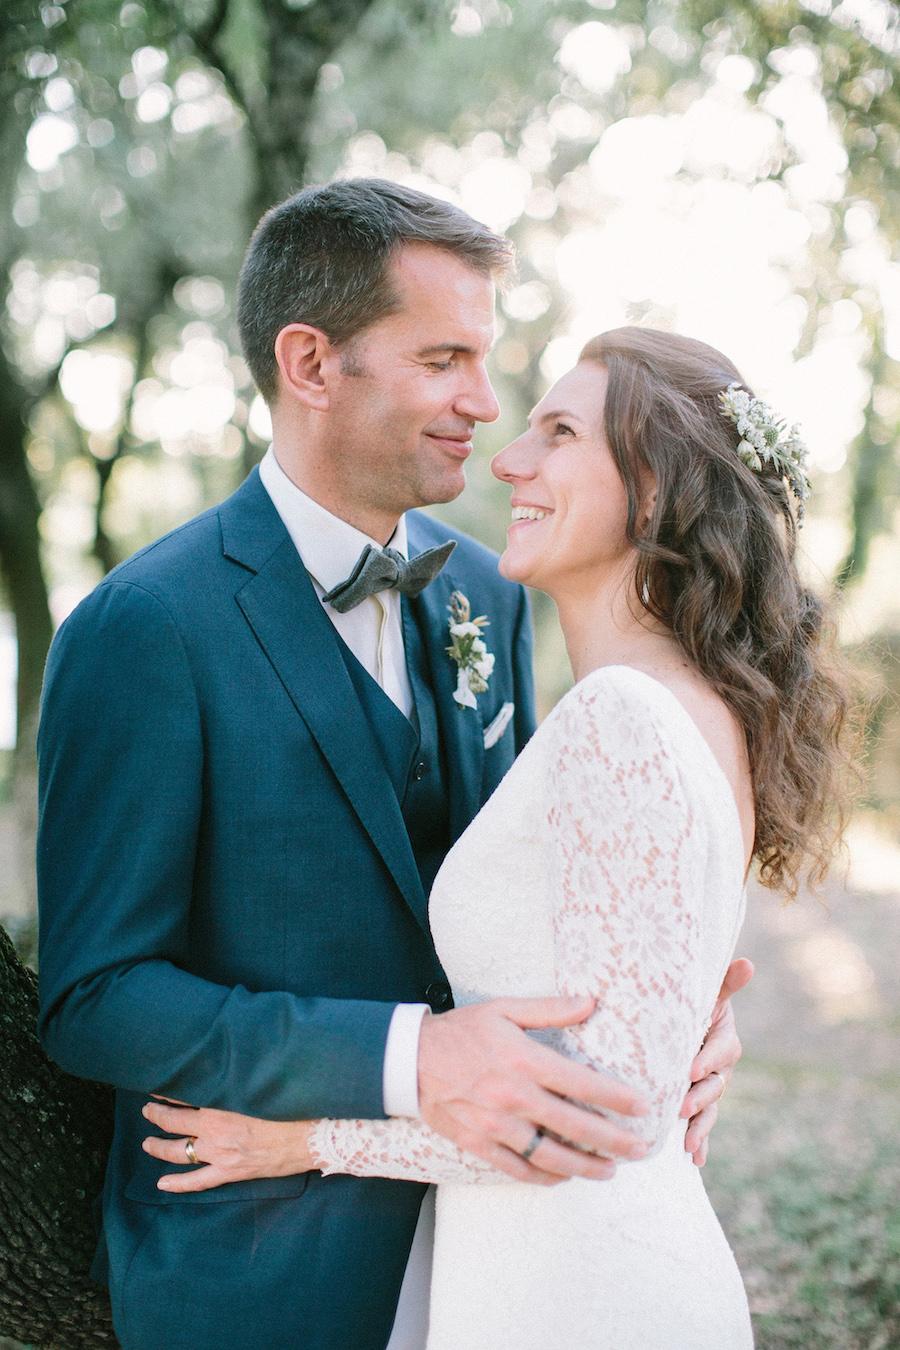 saya-photography-rustic-french-wedding-provence-domaines-de-patras-102.jpg